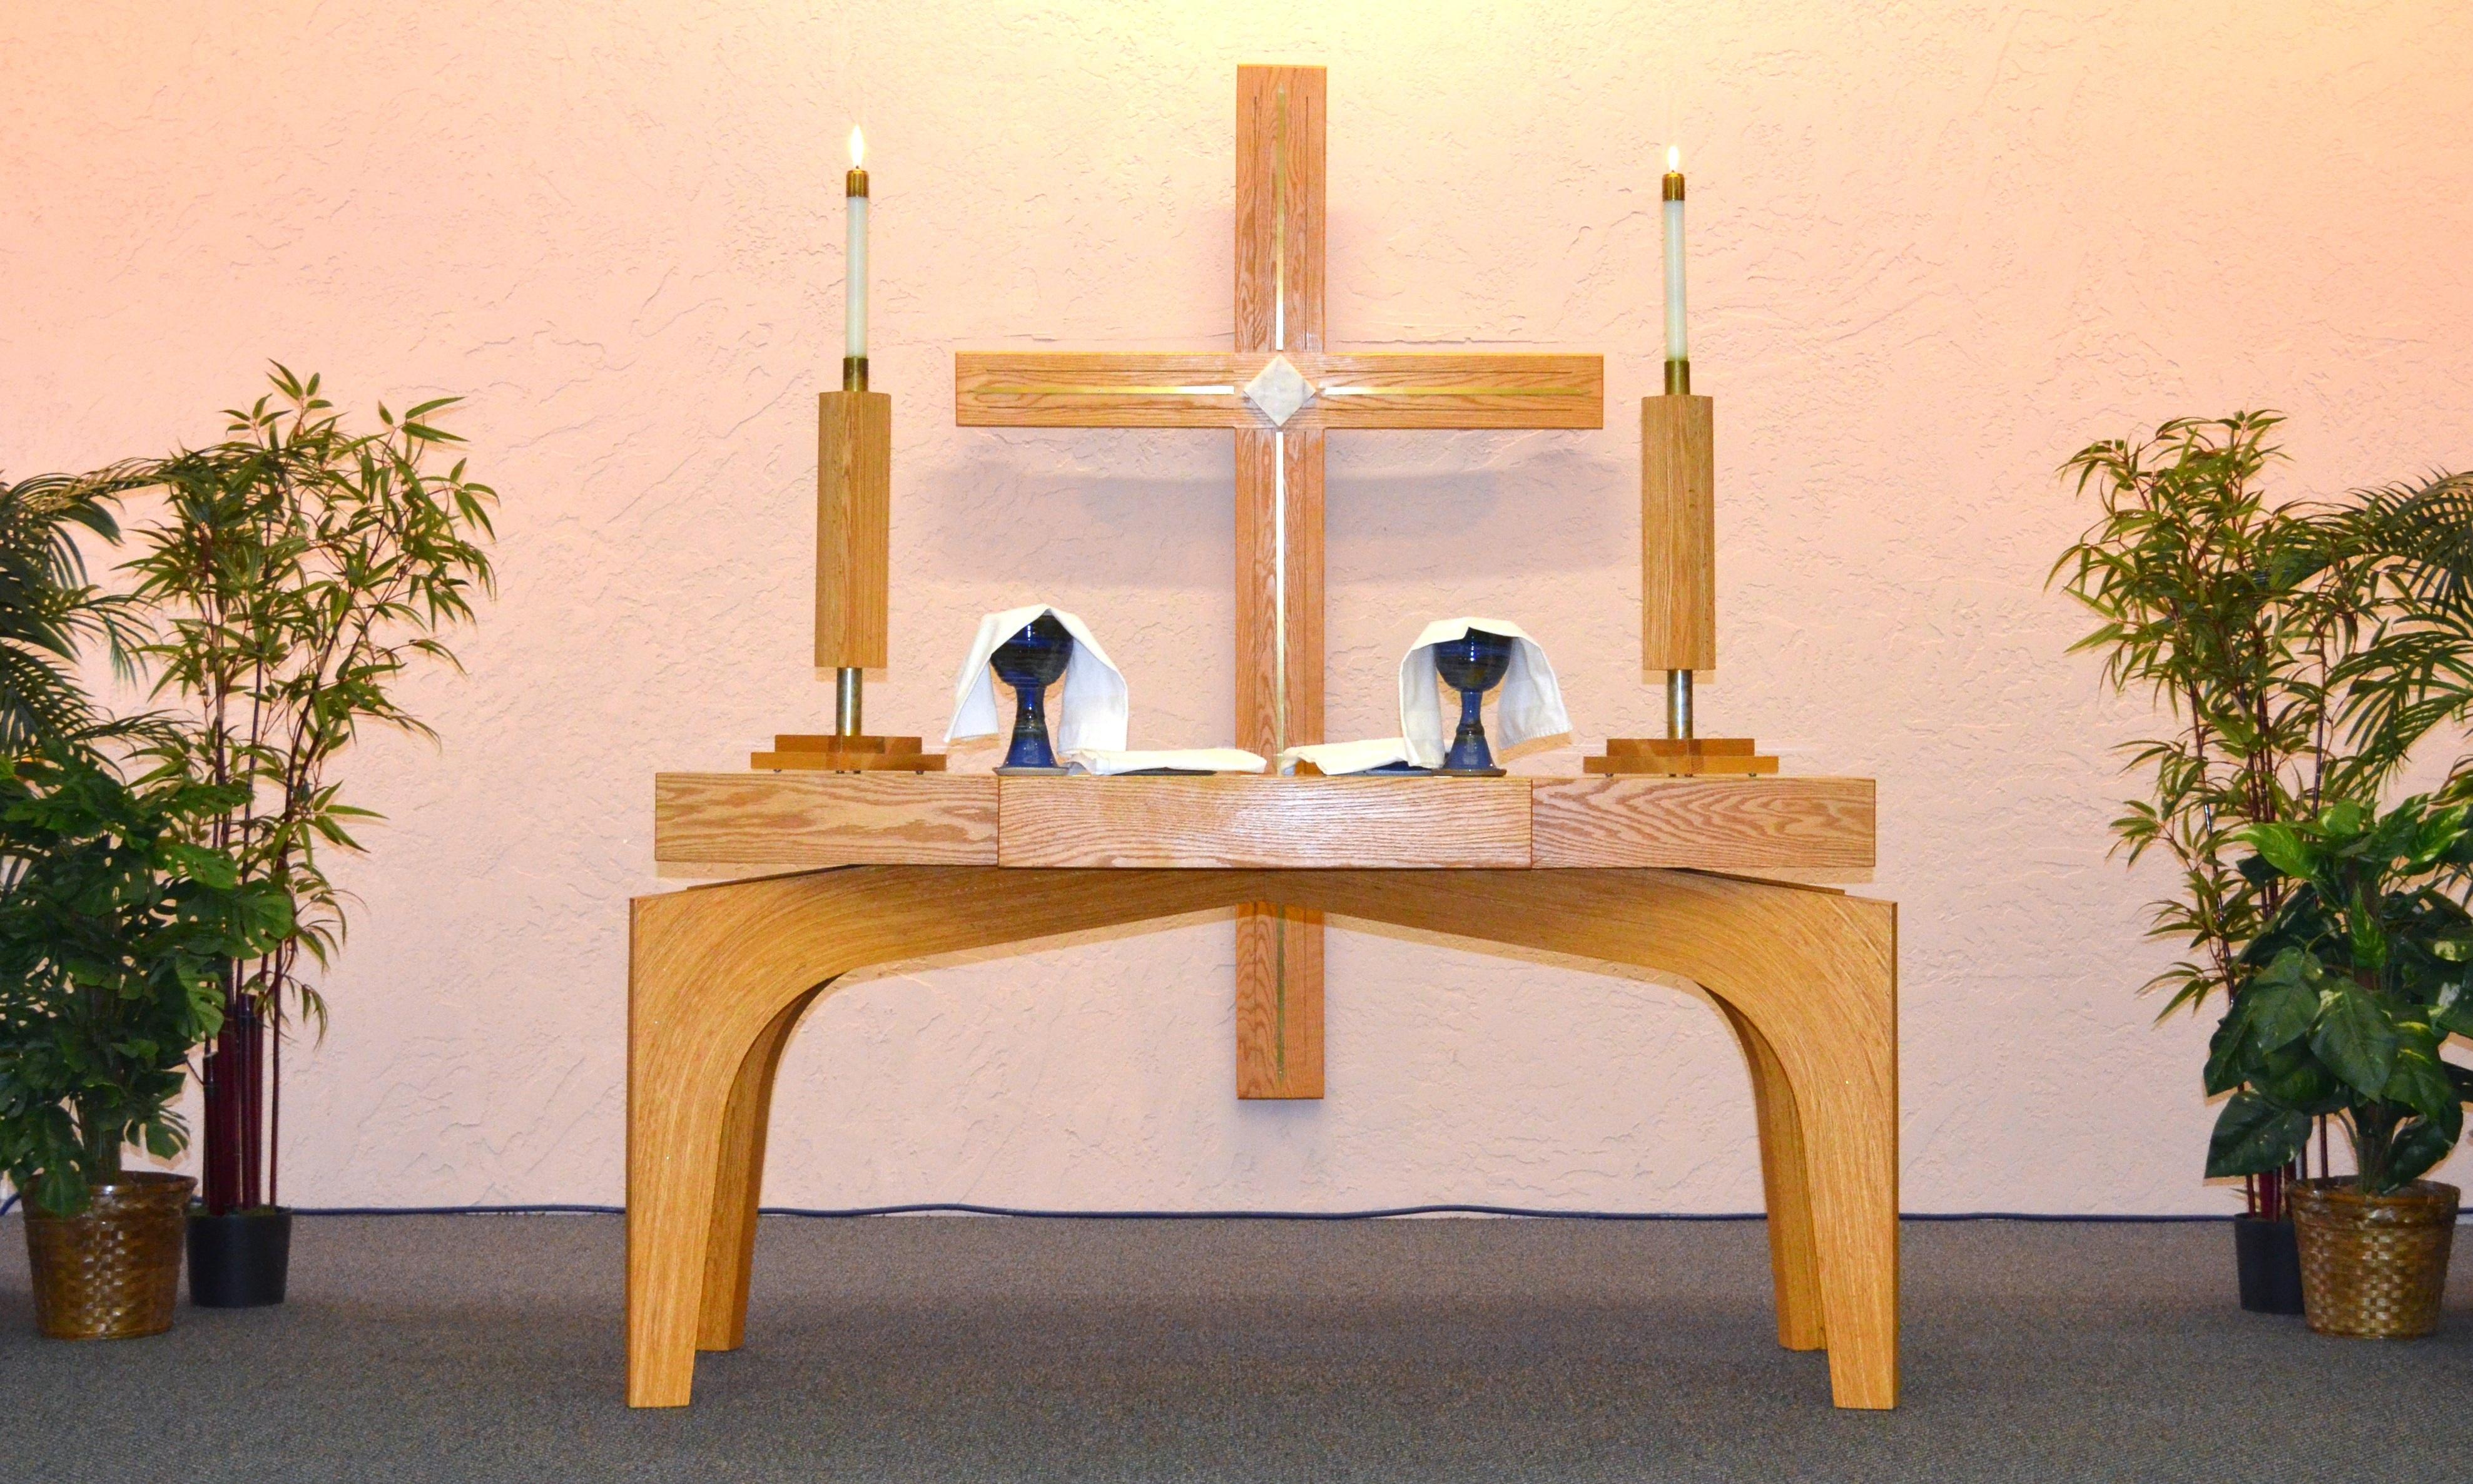 Table Wood Love Symbol Religion Church Cross Furniture Christian Spiritual  Pray Religious Christ Candles Faith Hope